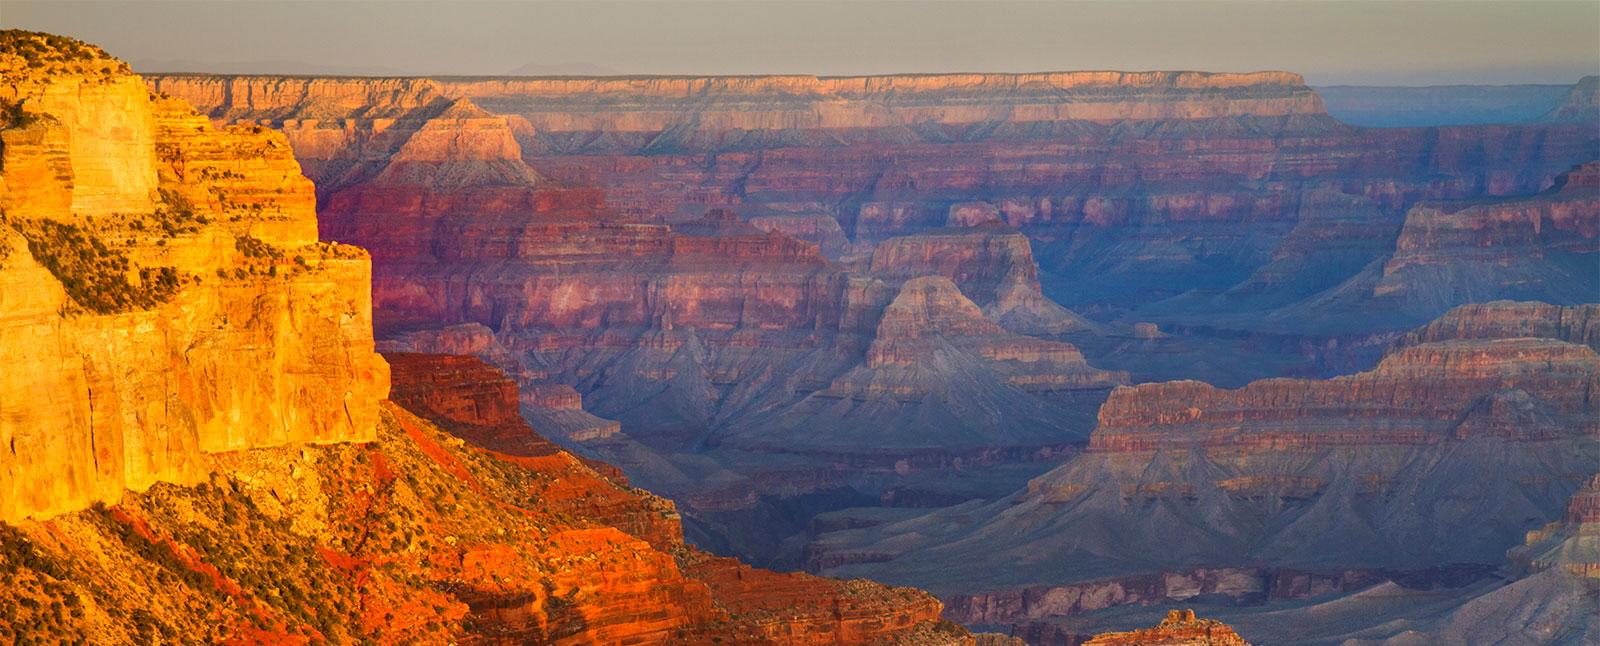 Road Scholar Grand Canyon Tours